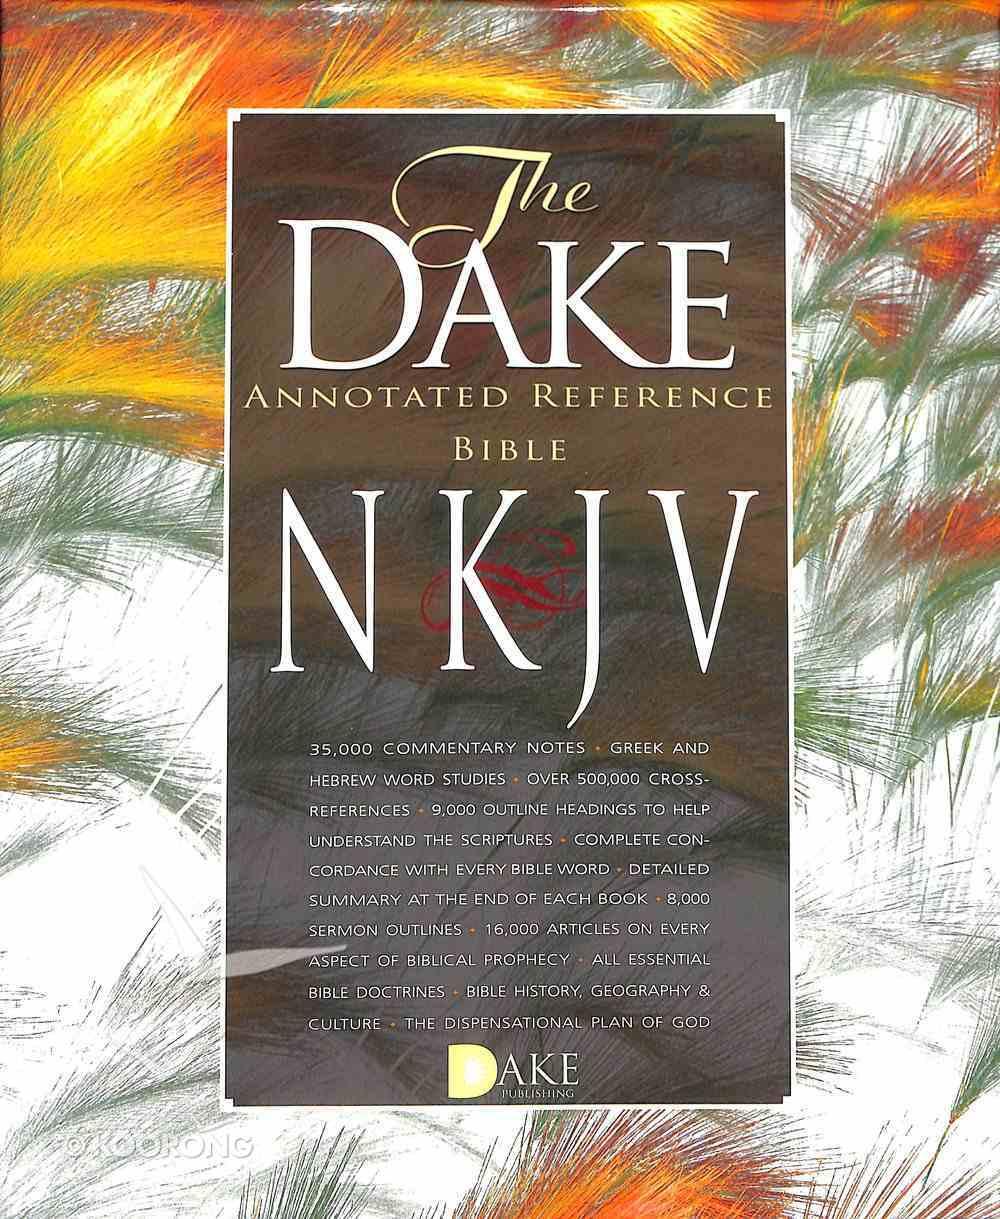 NKJV Dake Annotated Reference Bible Burgundy Leathersoft Premium Imitation Leather